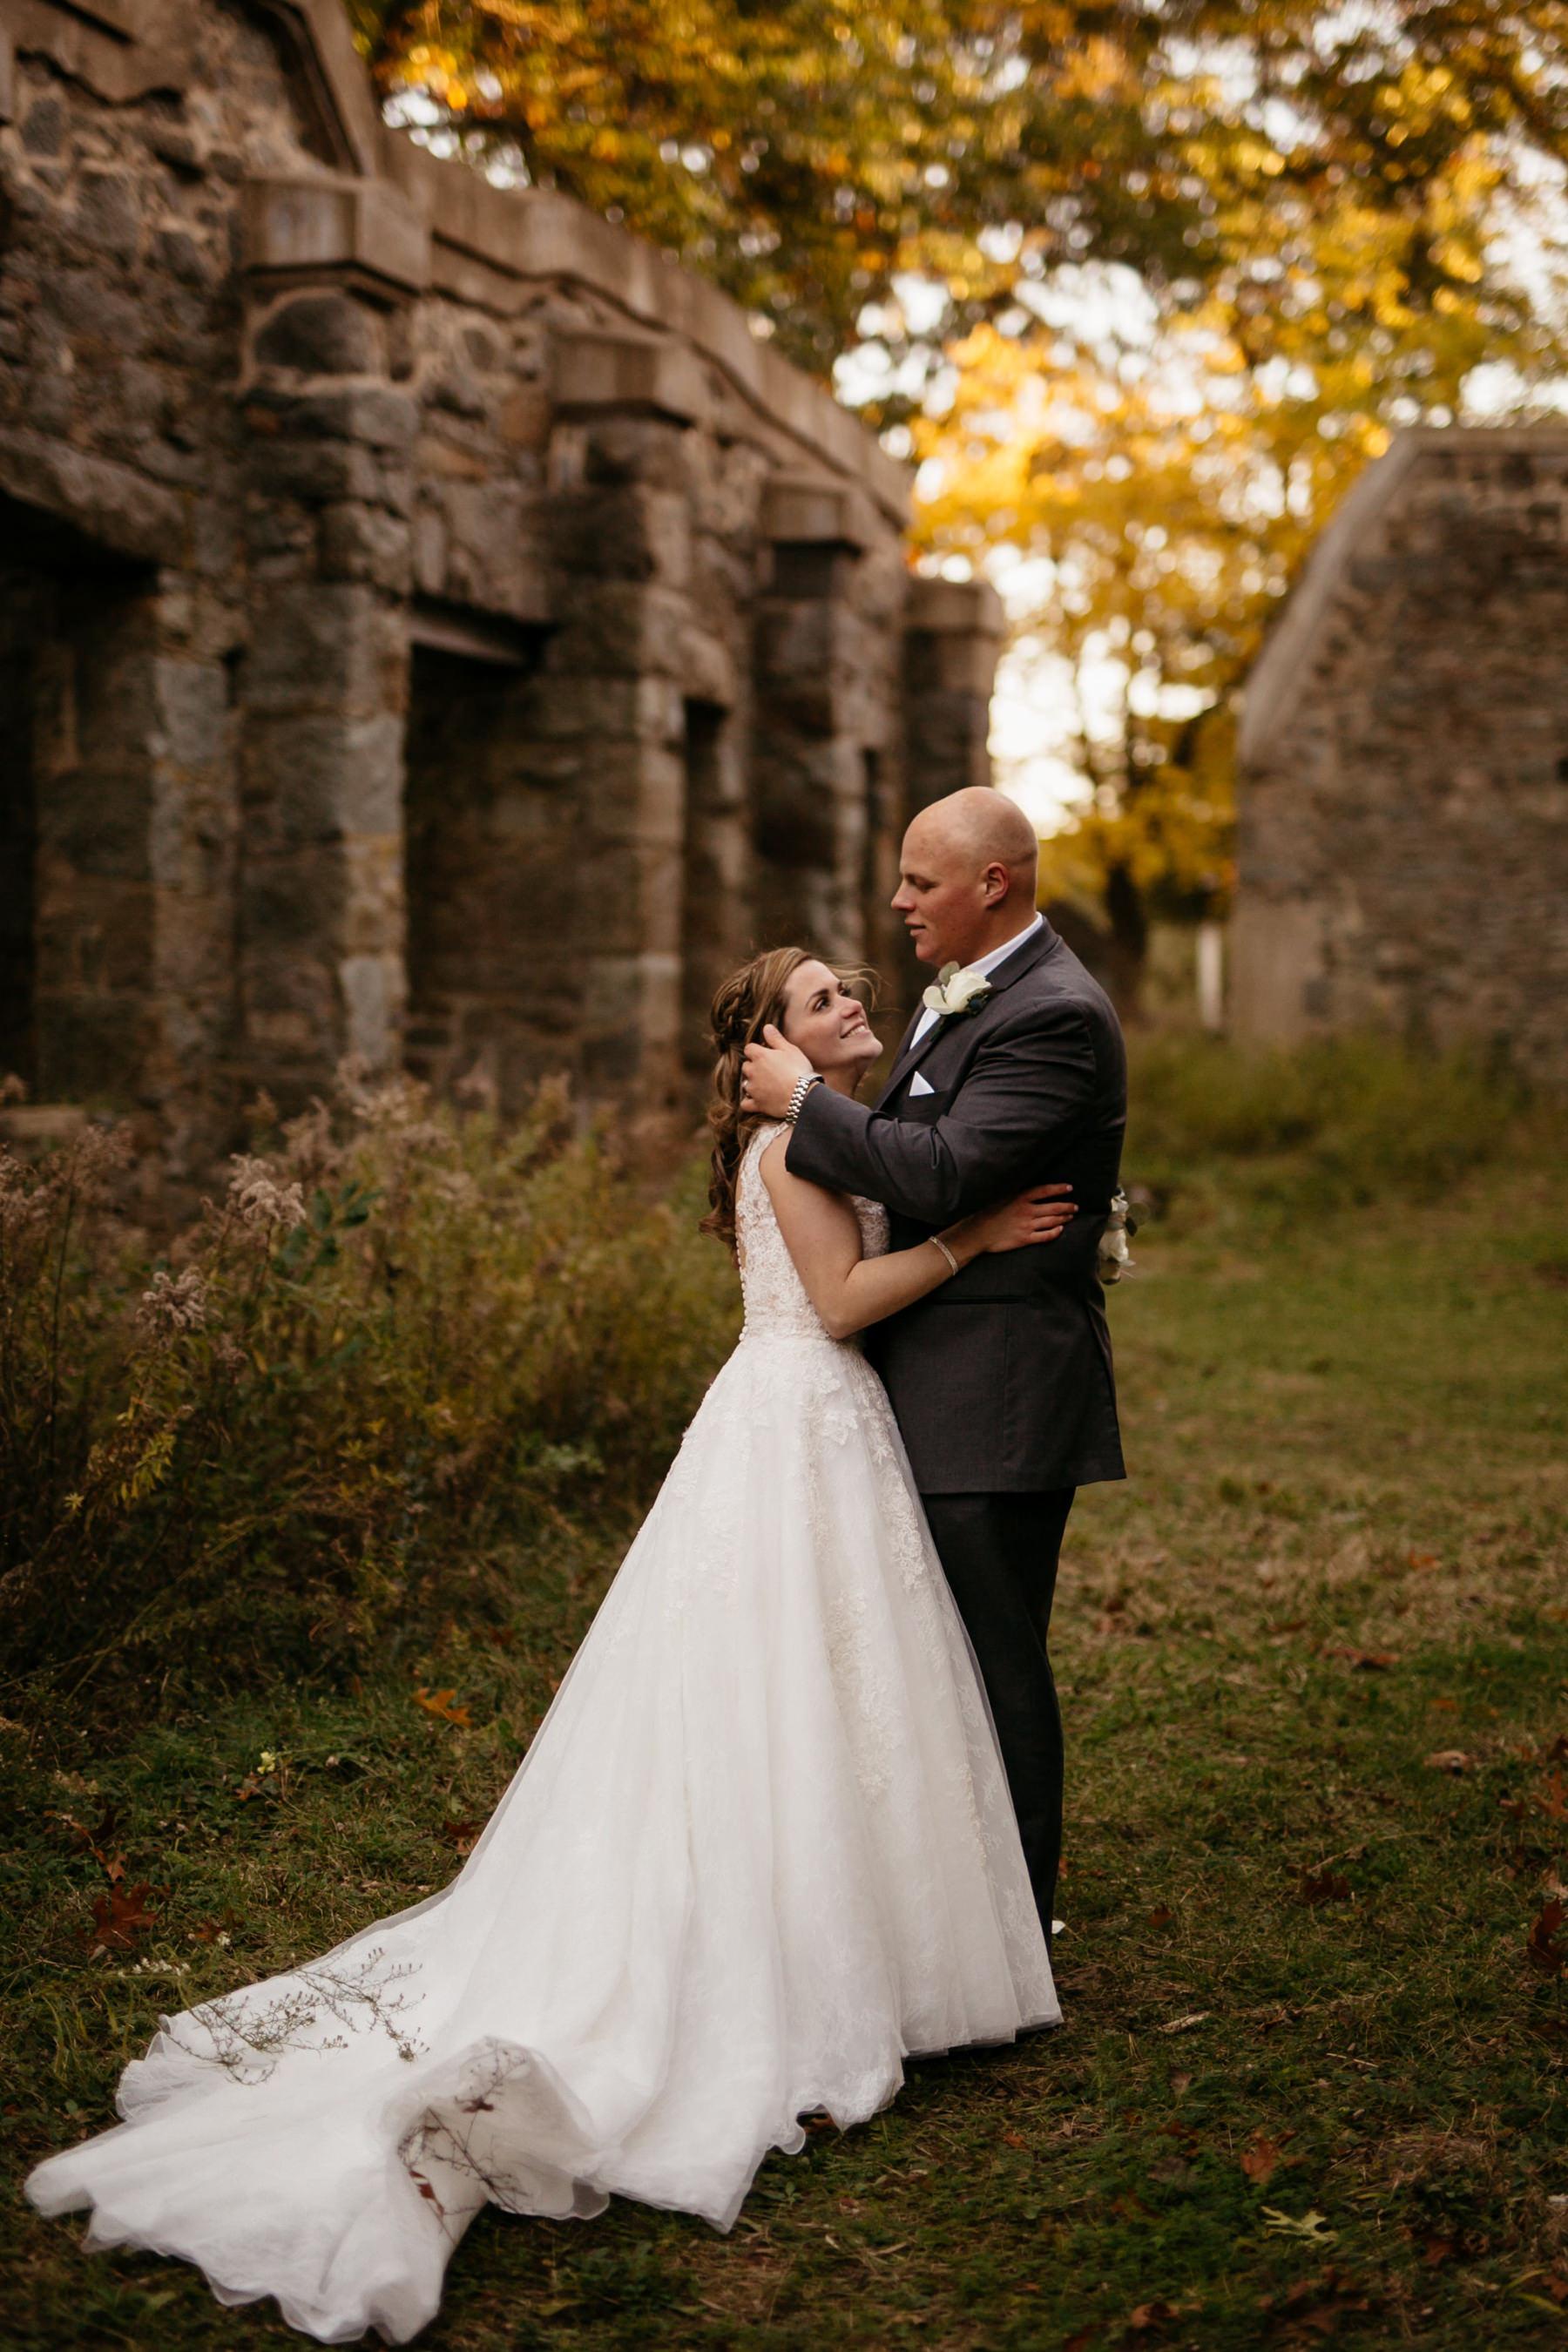 Quincy Ma Massachusetts Wedding Dedham Boston Granie Links Wedding New England Catholic Cathedral Liz Osban Photography 70.jpg